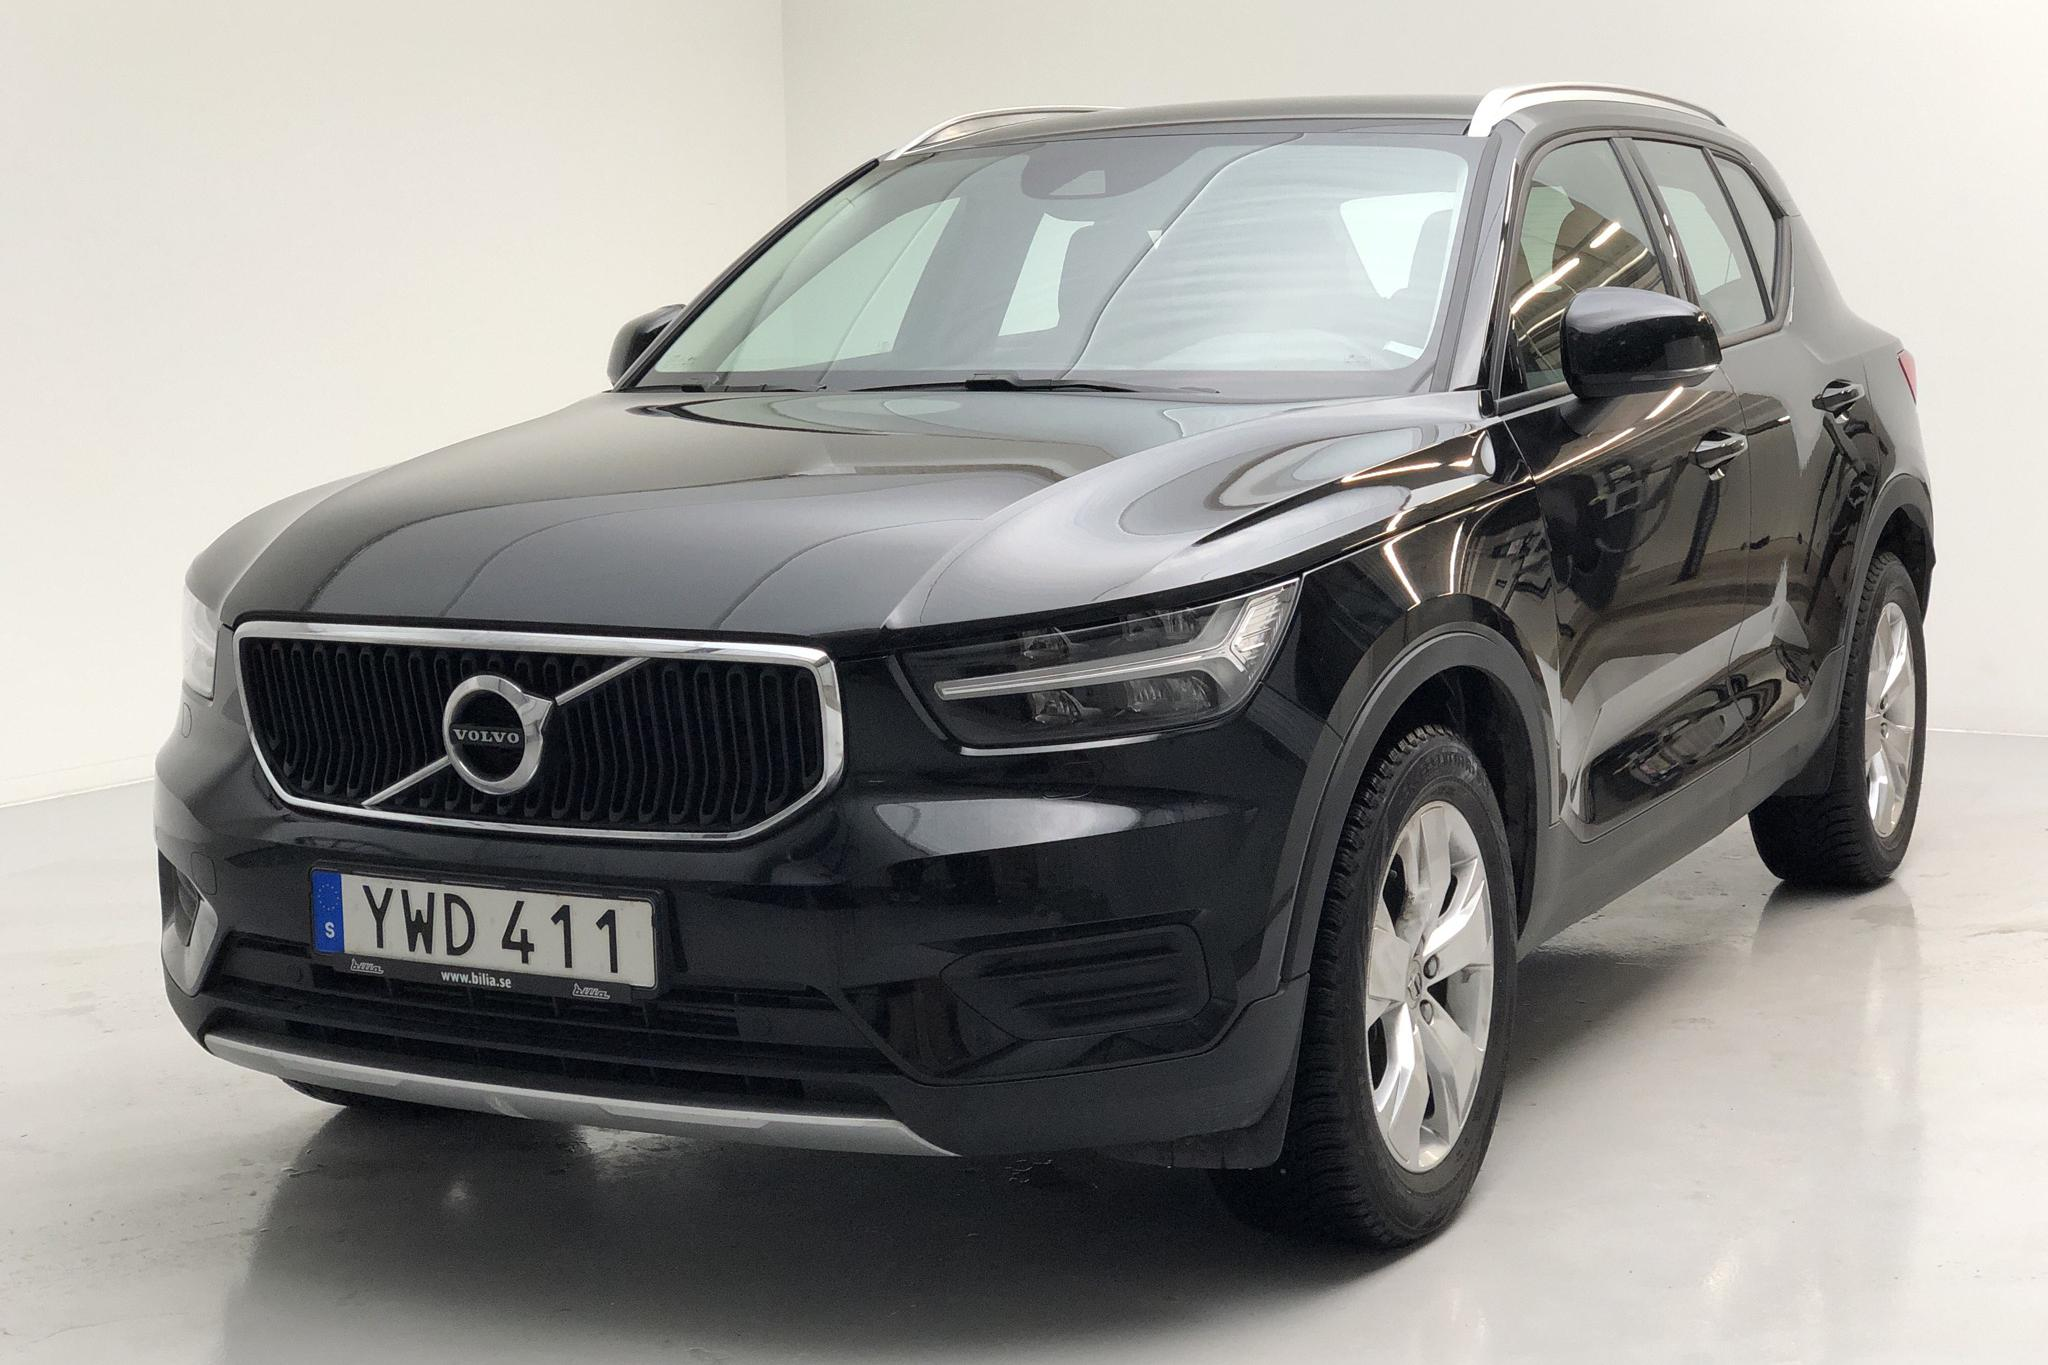 Volvo XC40 D3 2WD (150hk) - 32 040 km - Automatic - black - 2019